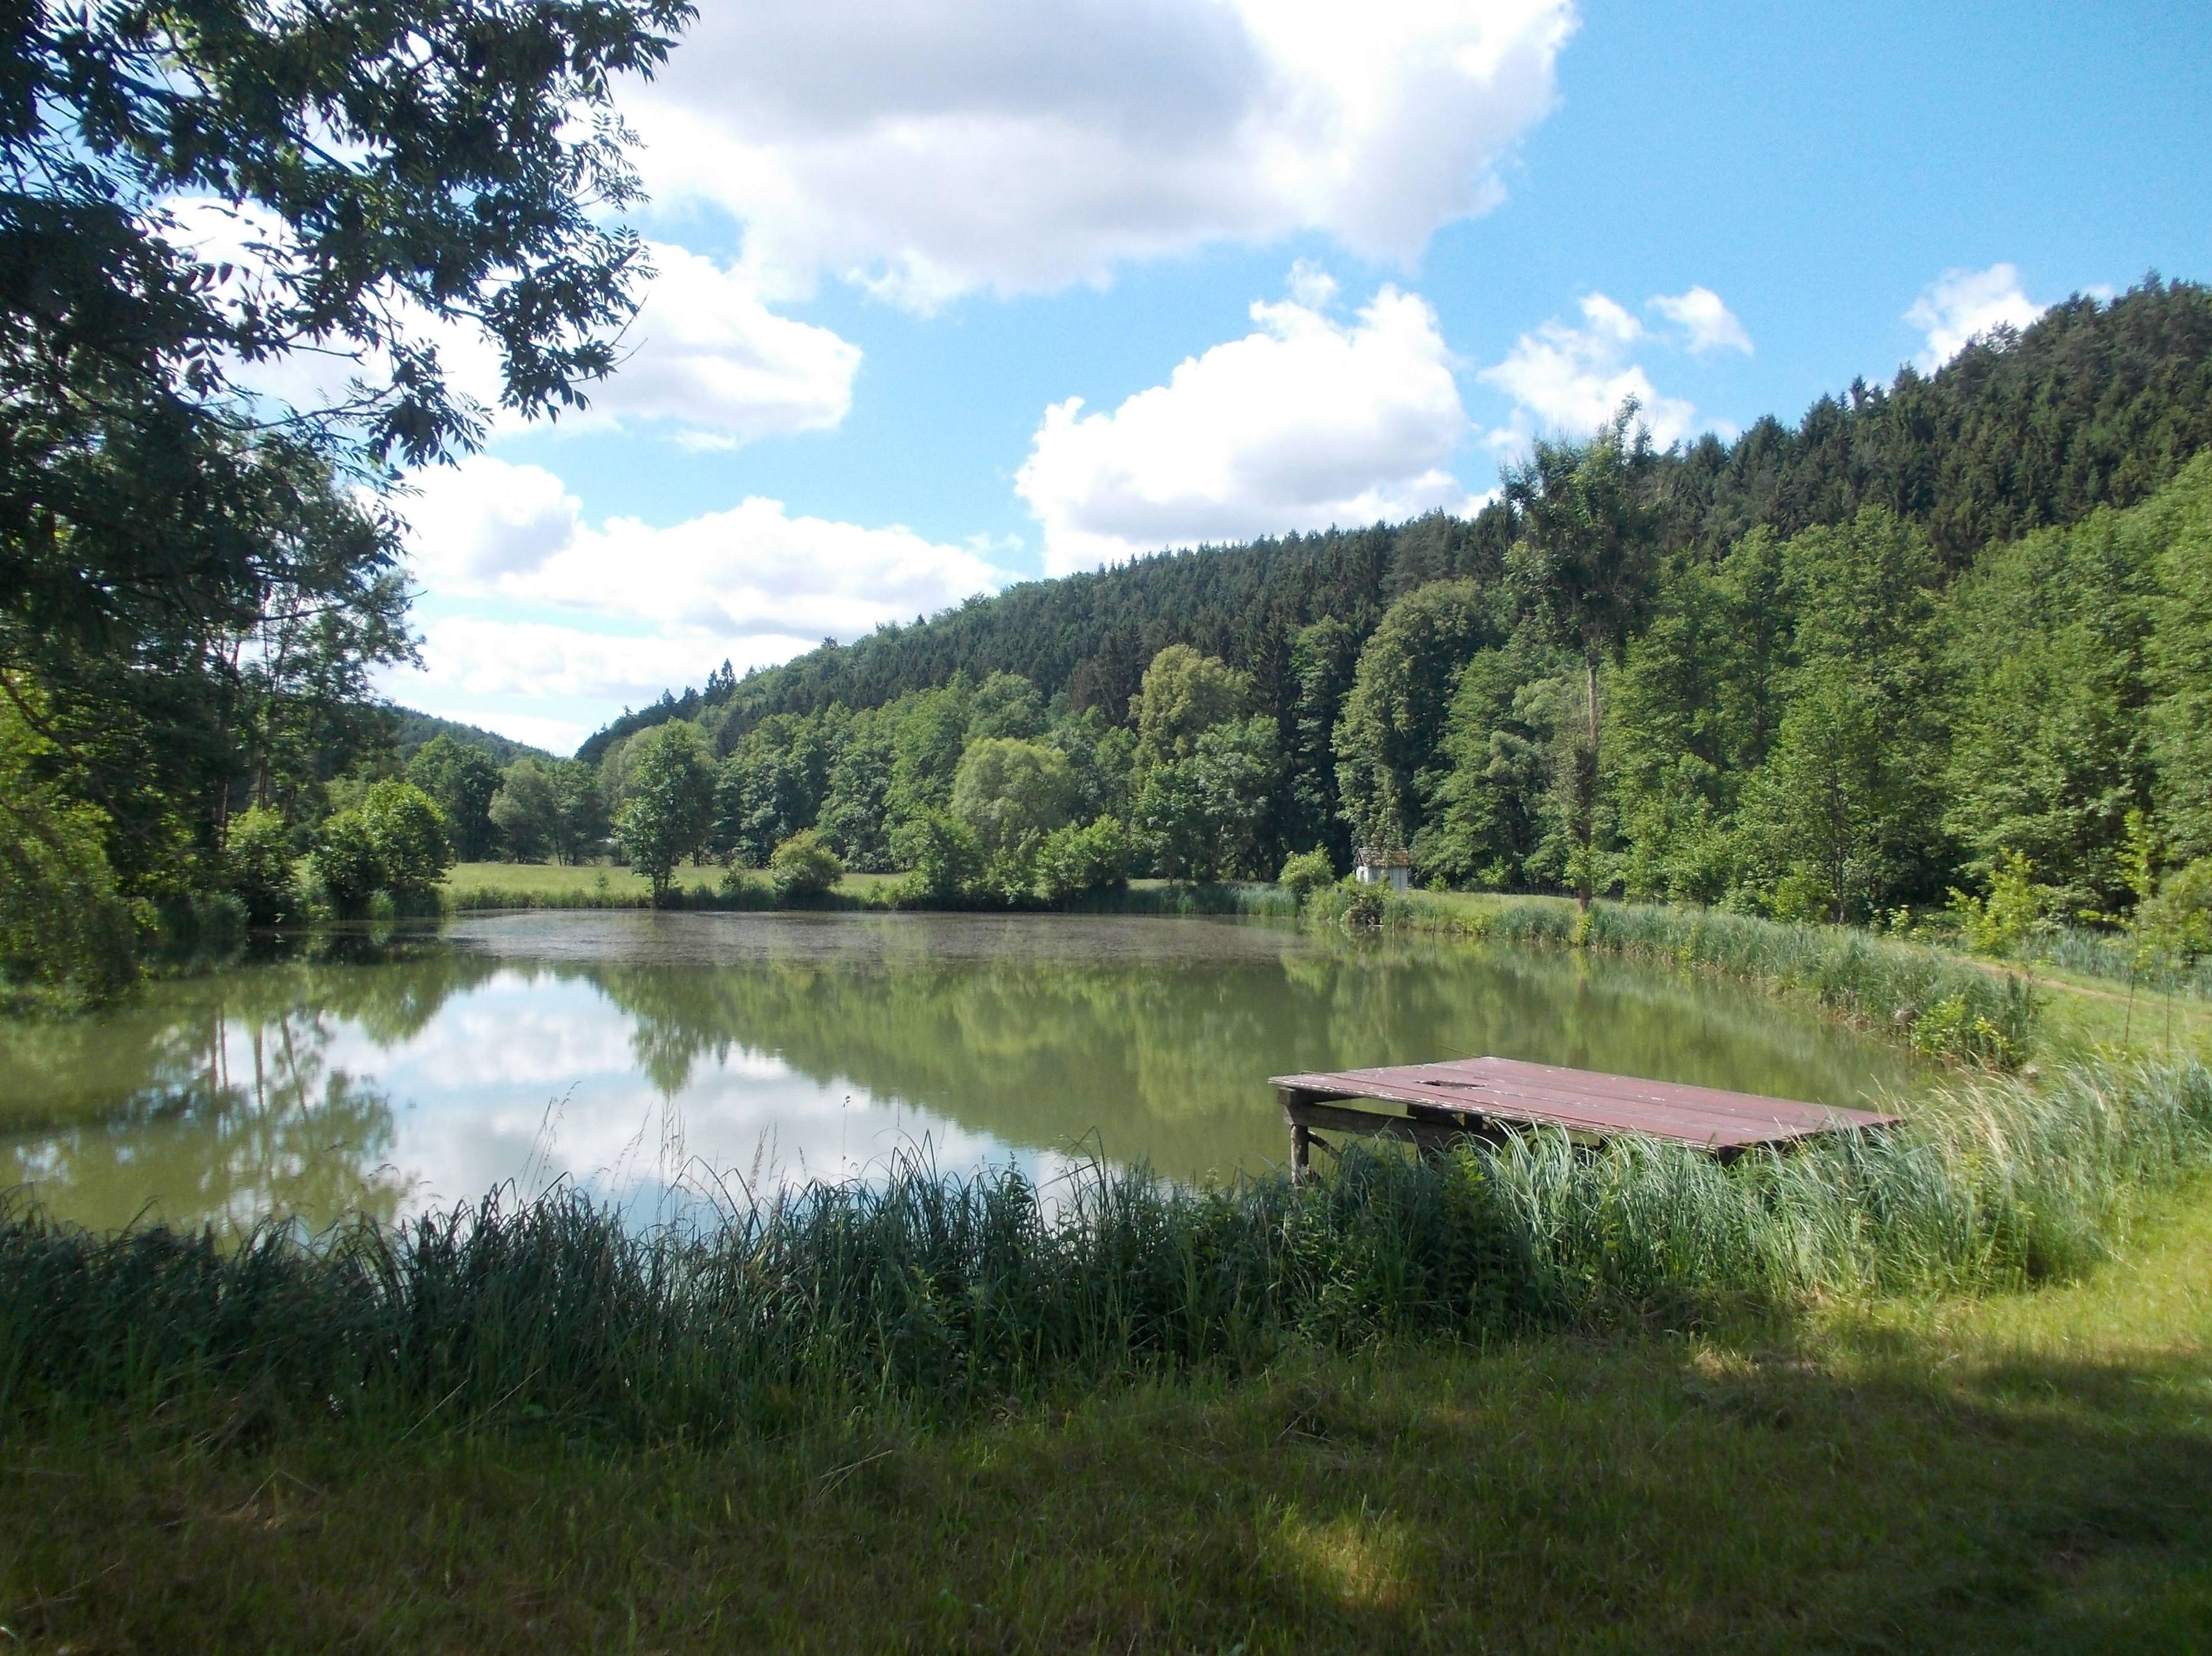 Hügelland, Thuringia, Germany